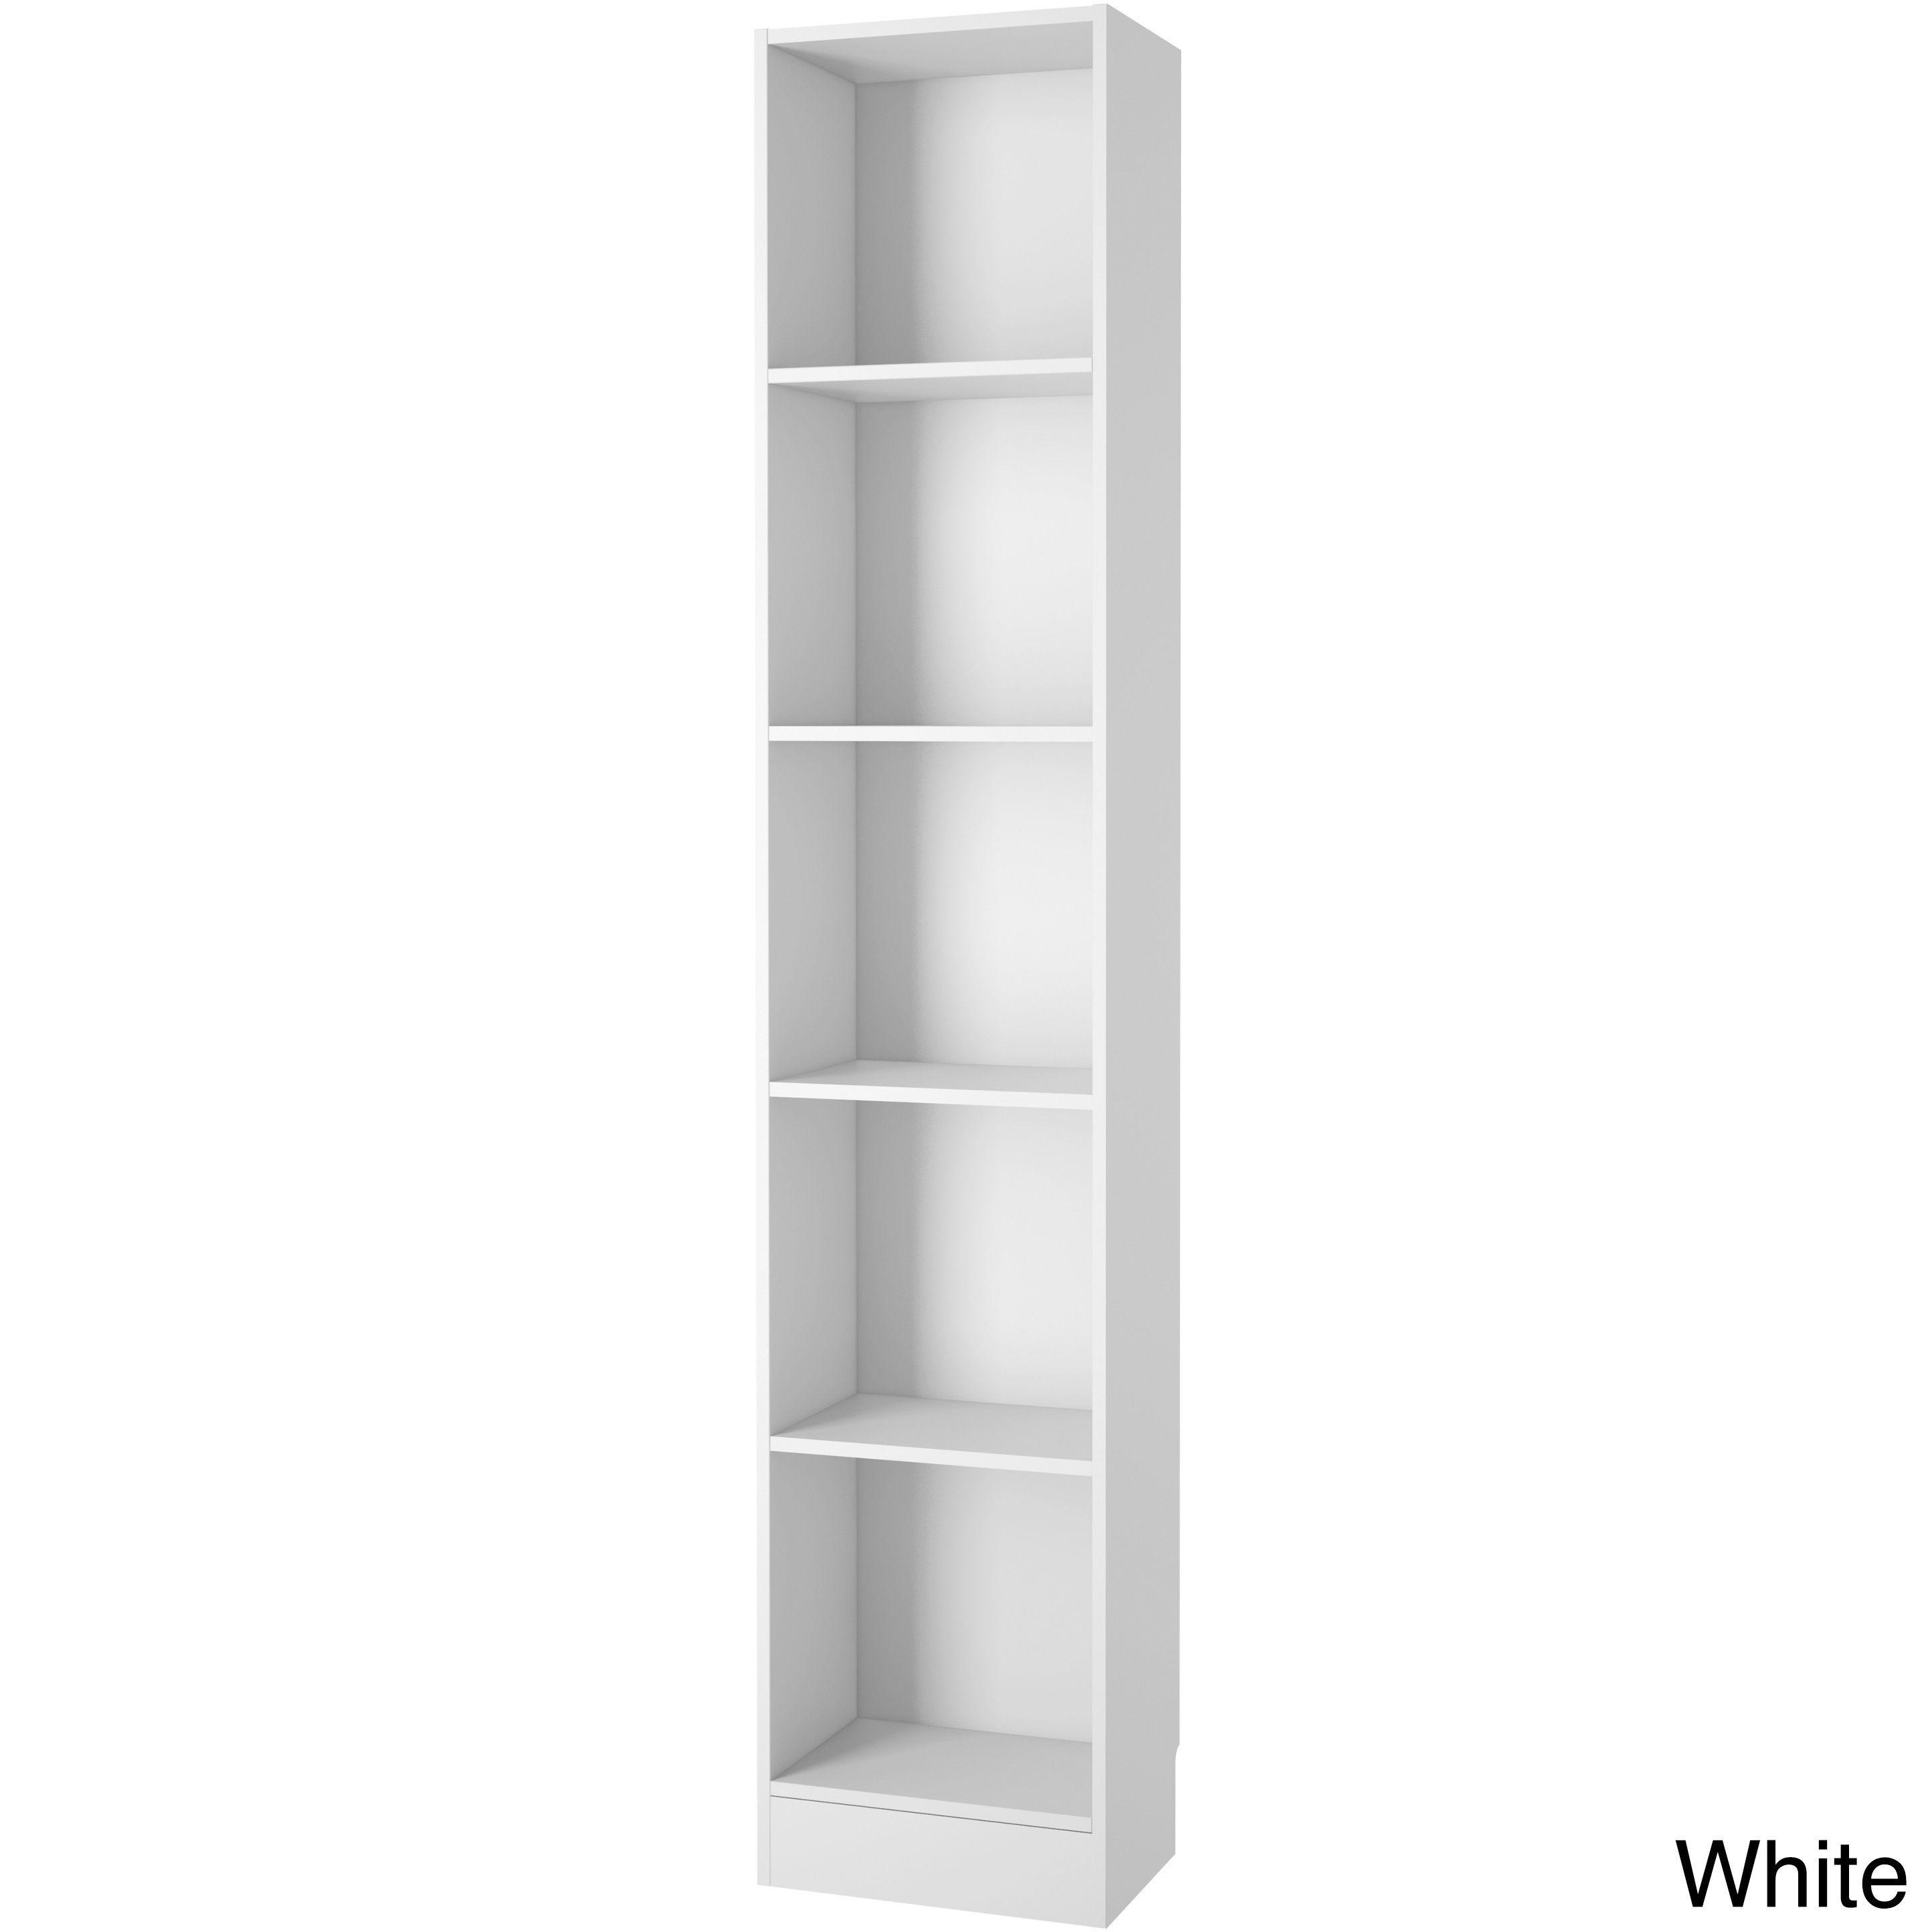 element tall narrow 5 shelf bookcase white white finish rh pinterest com tall narrow shelves with baskets